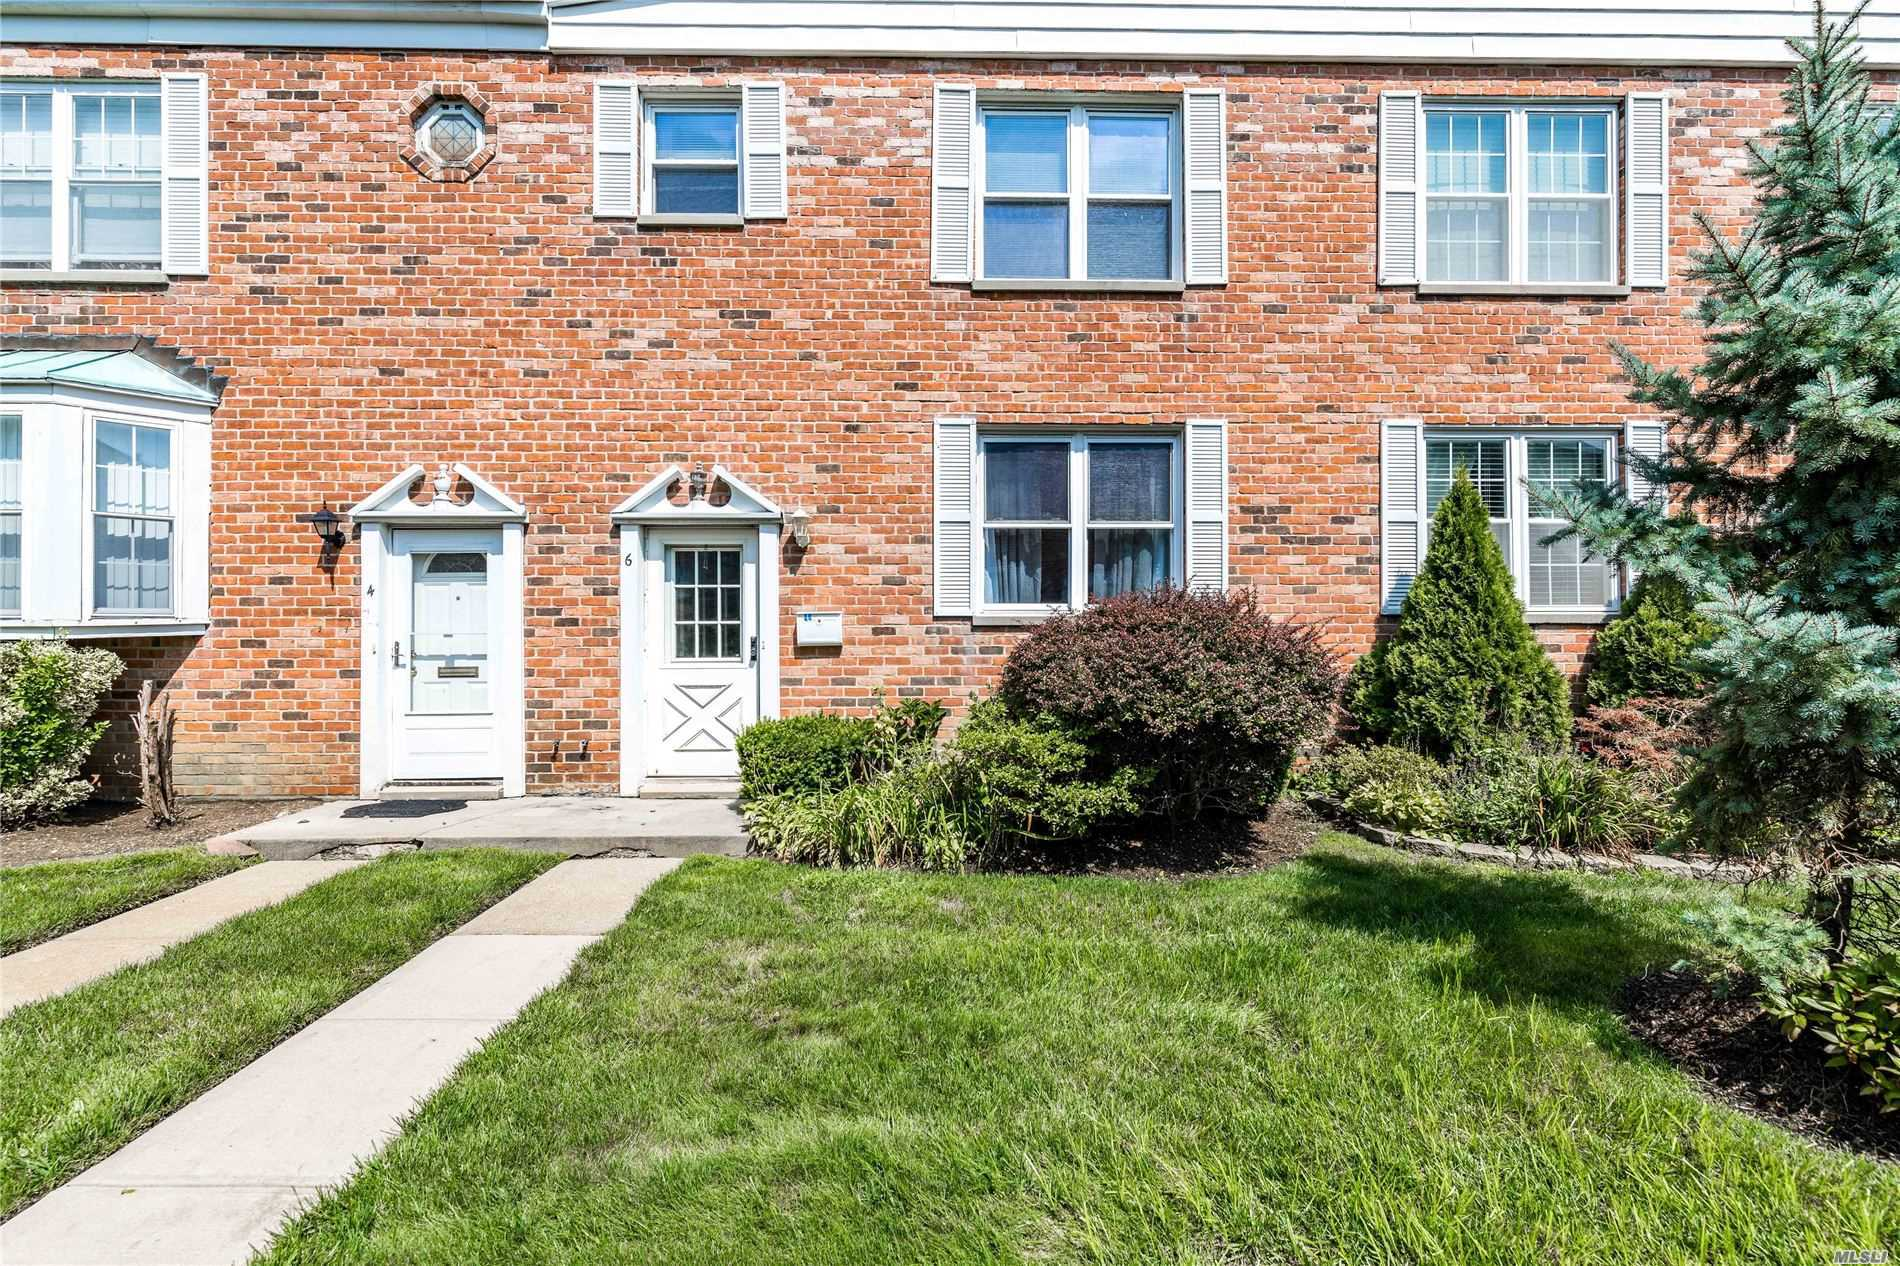 Property for sale at 930 Merrick Road # 6, Baldwin NY 11510, Baldwin,  New York 11510